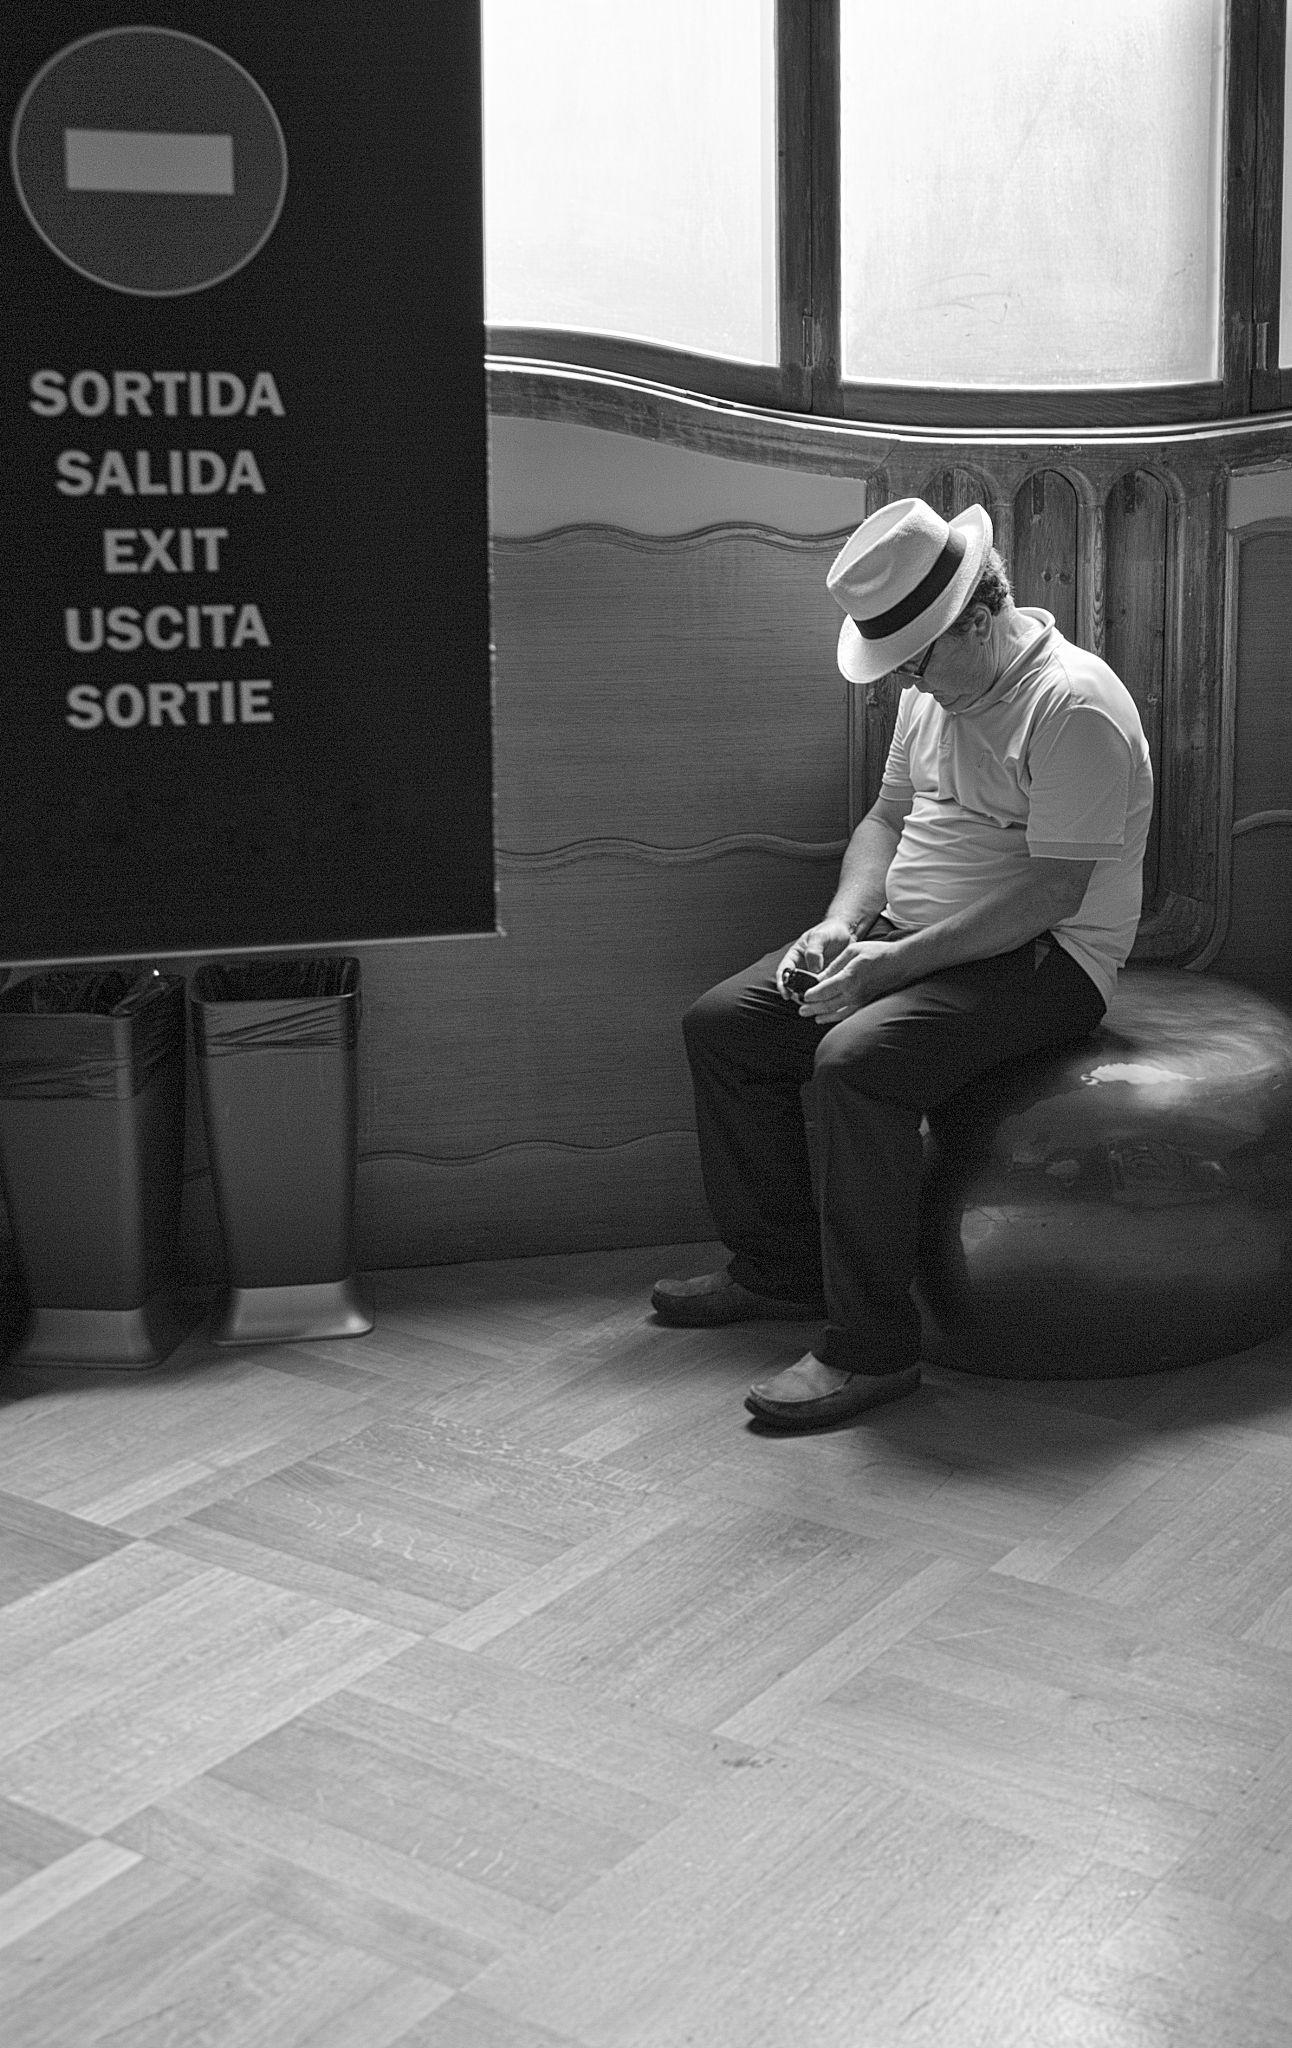 Man in Batllò House by claudiadottavi1982